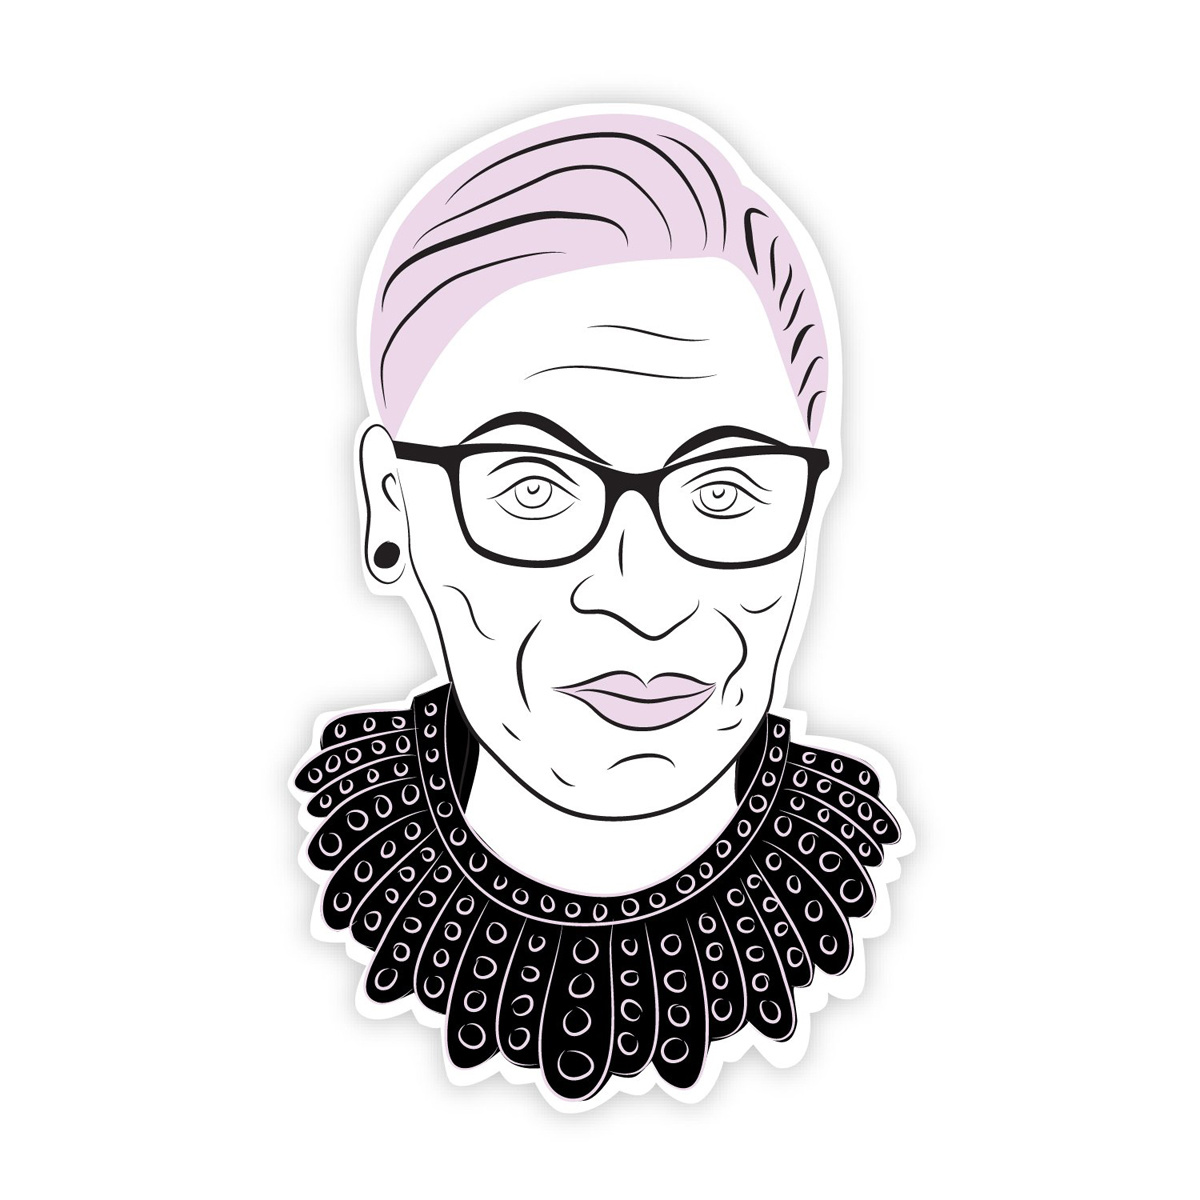 Boss Dotty Ruth Bader Ginsburg RBG Head Sticker